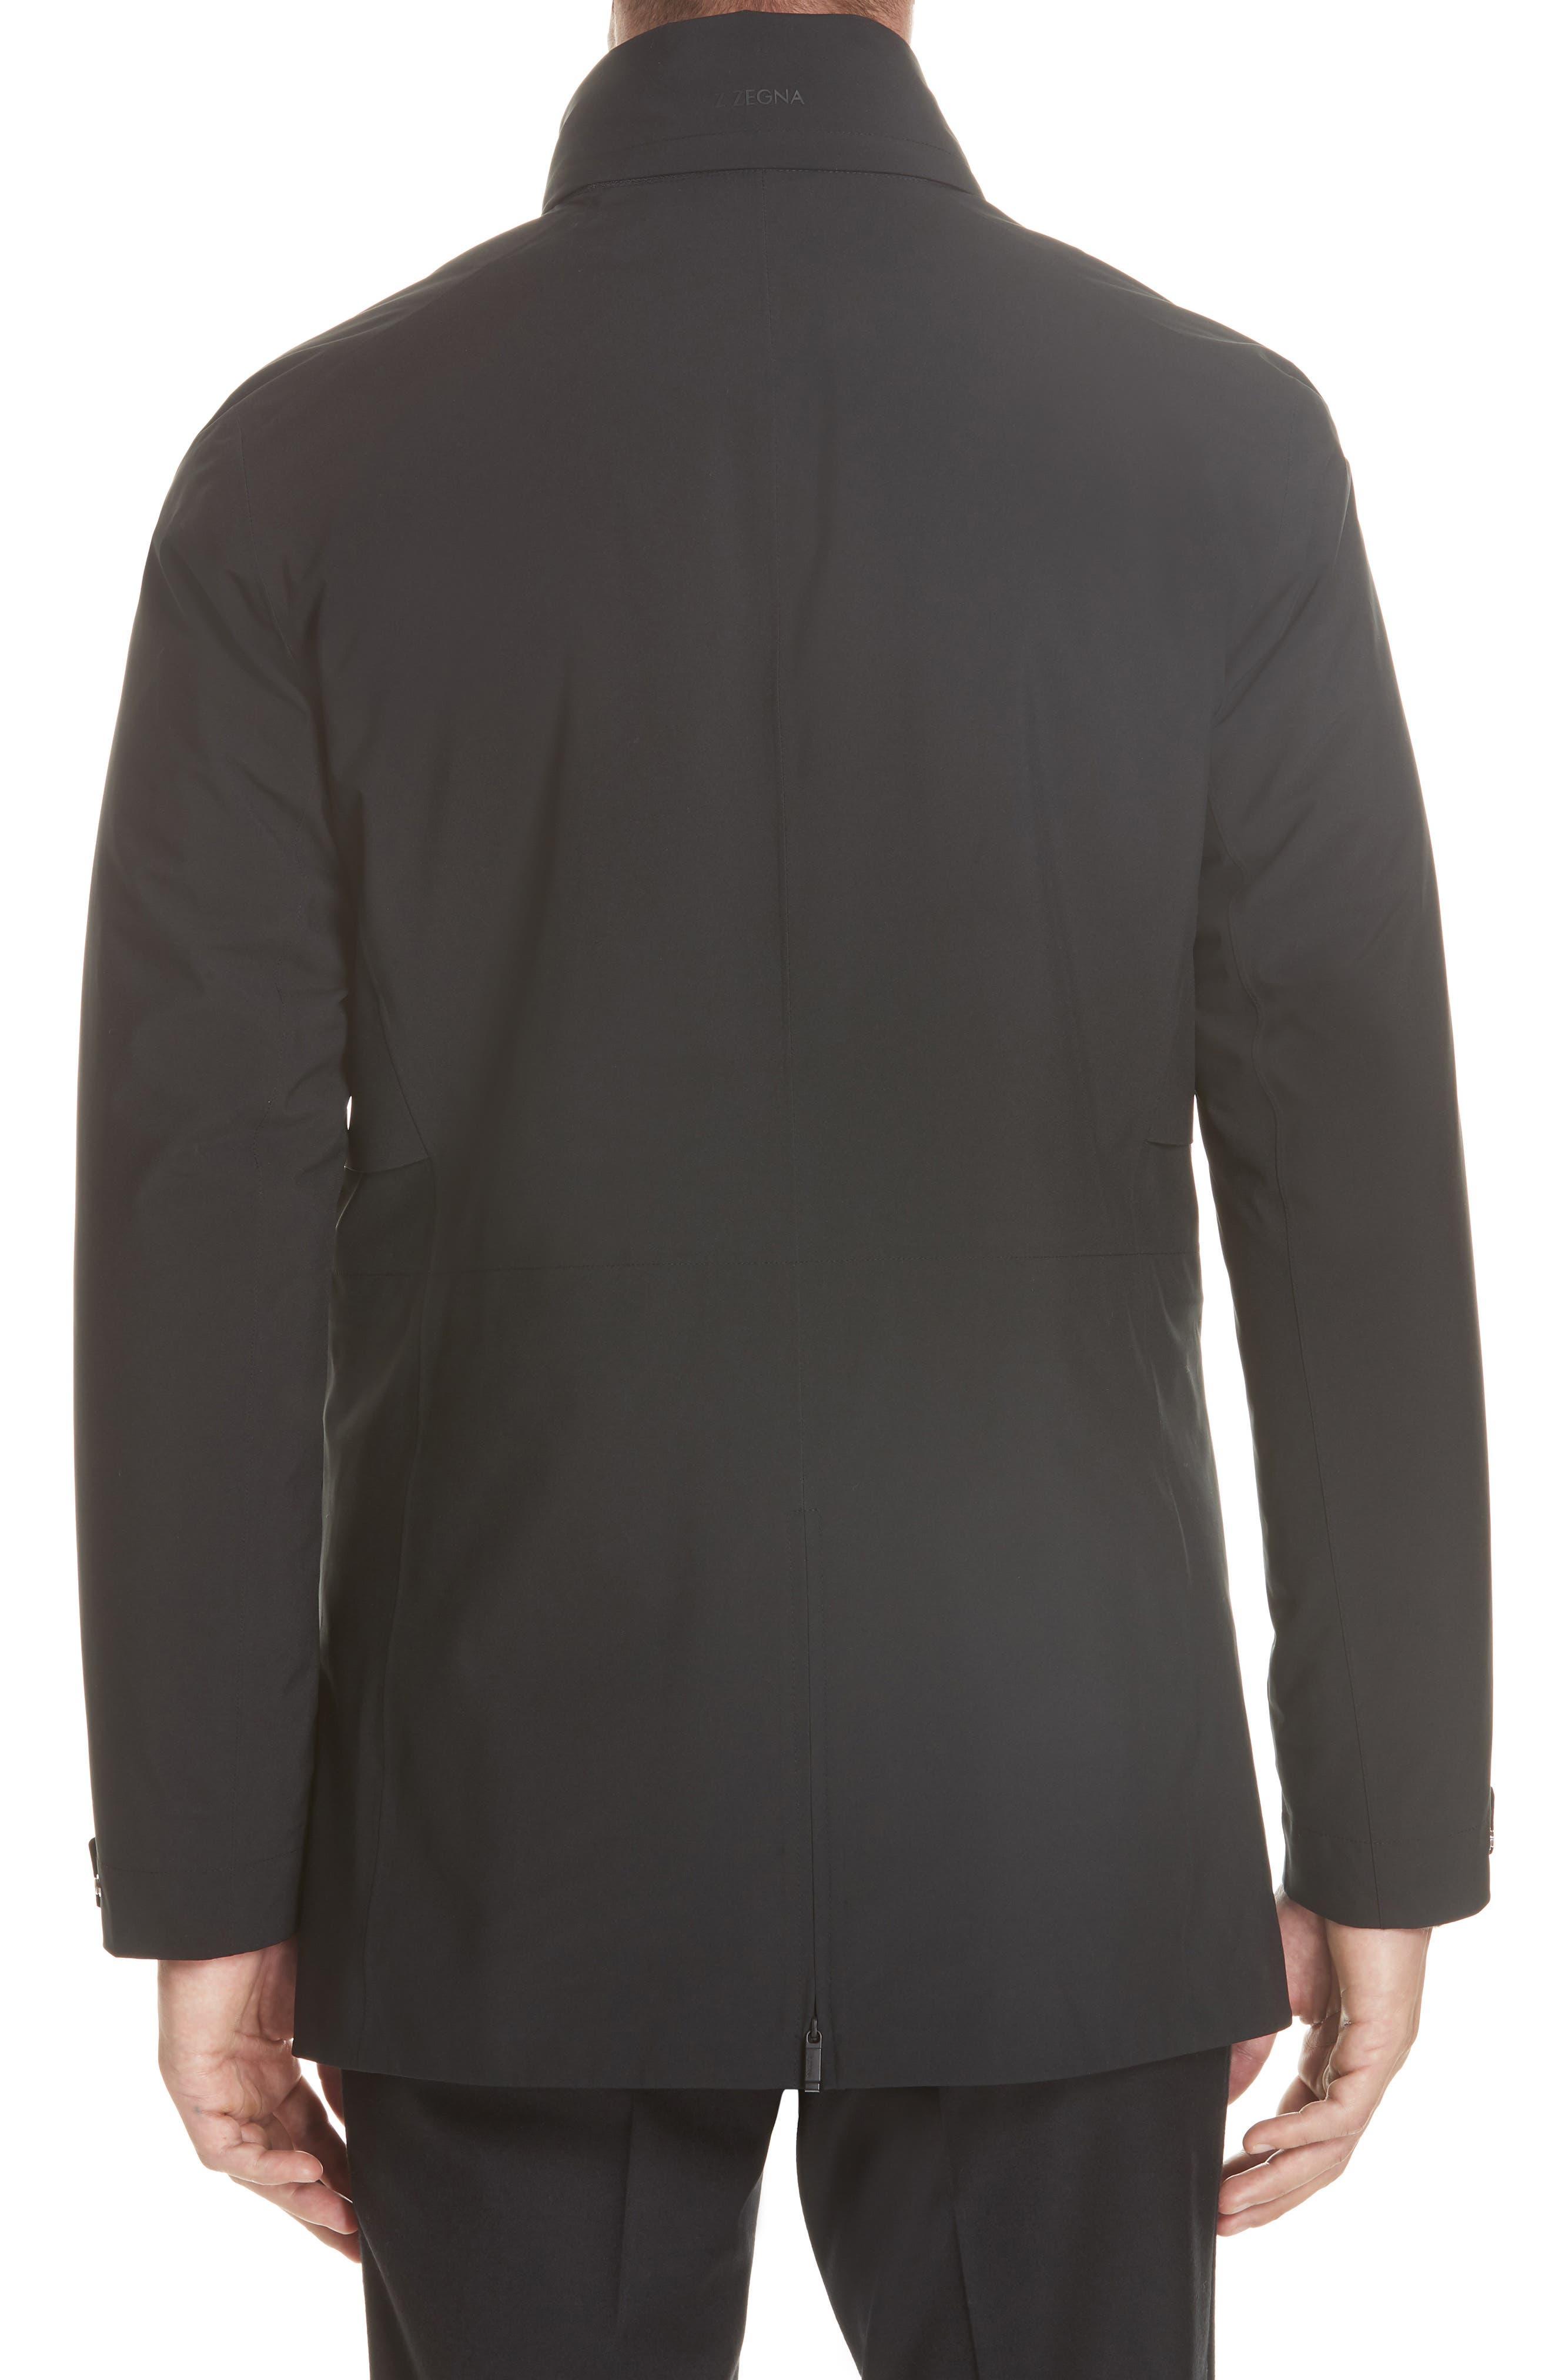 Z Zenga Trim Fit 3-in-1 Jacket,                             Alternate thumbnail 3, color,                             BLACK